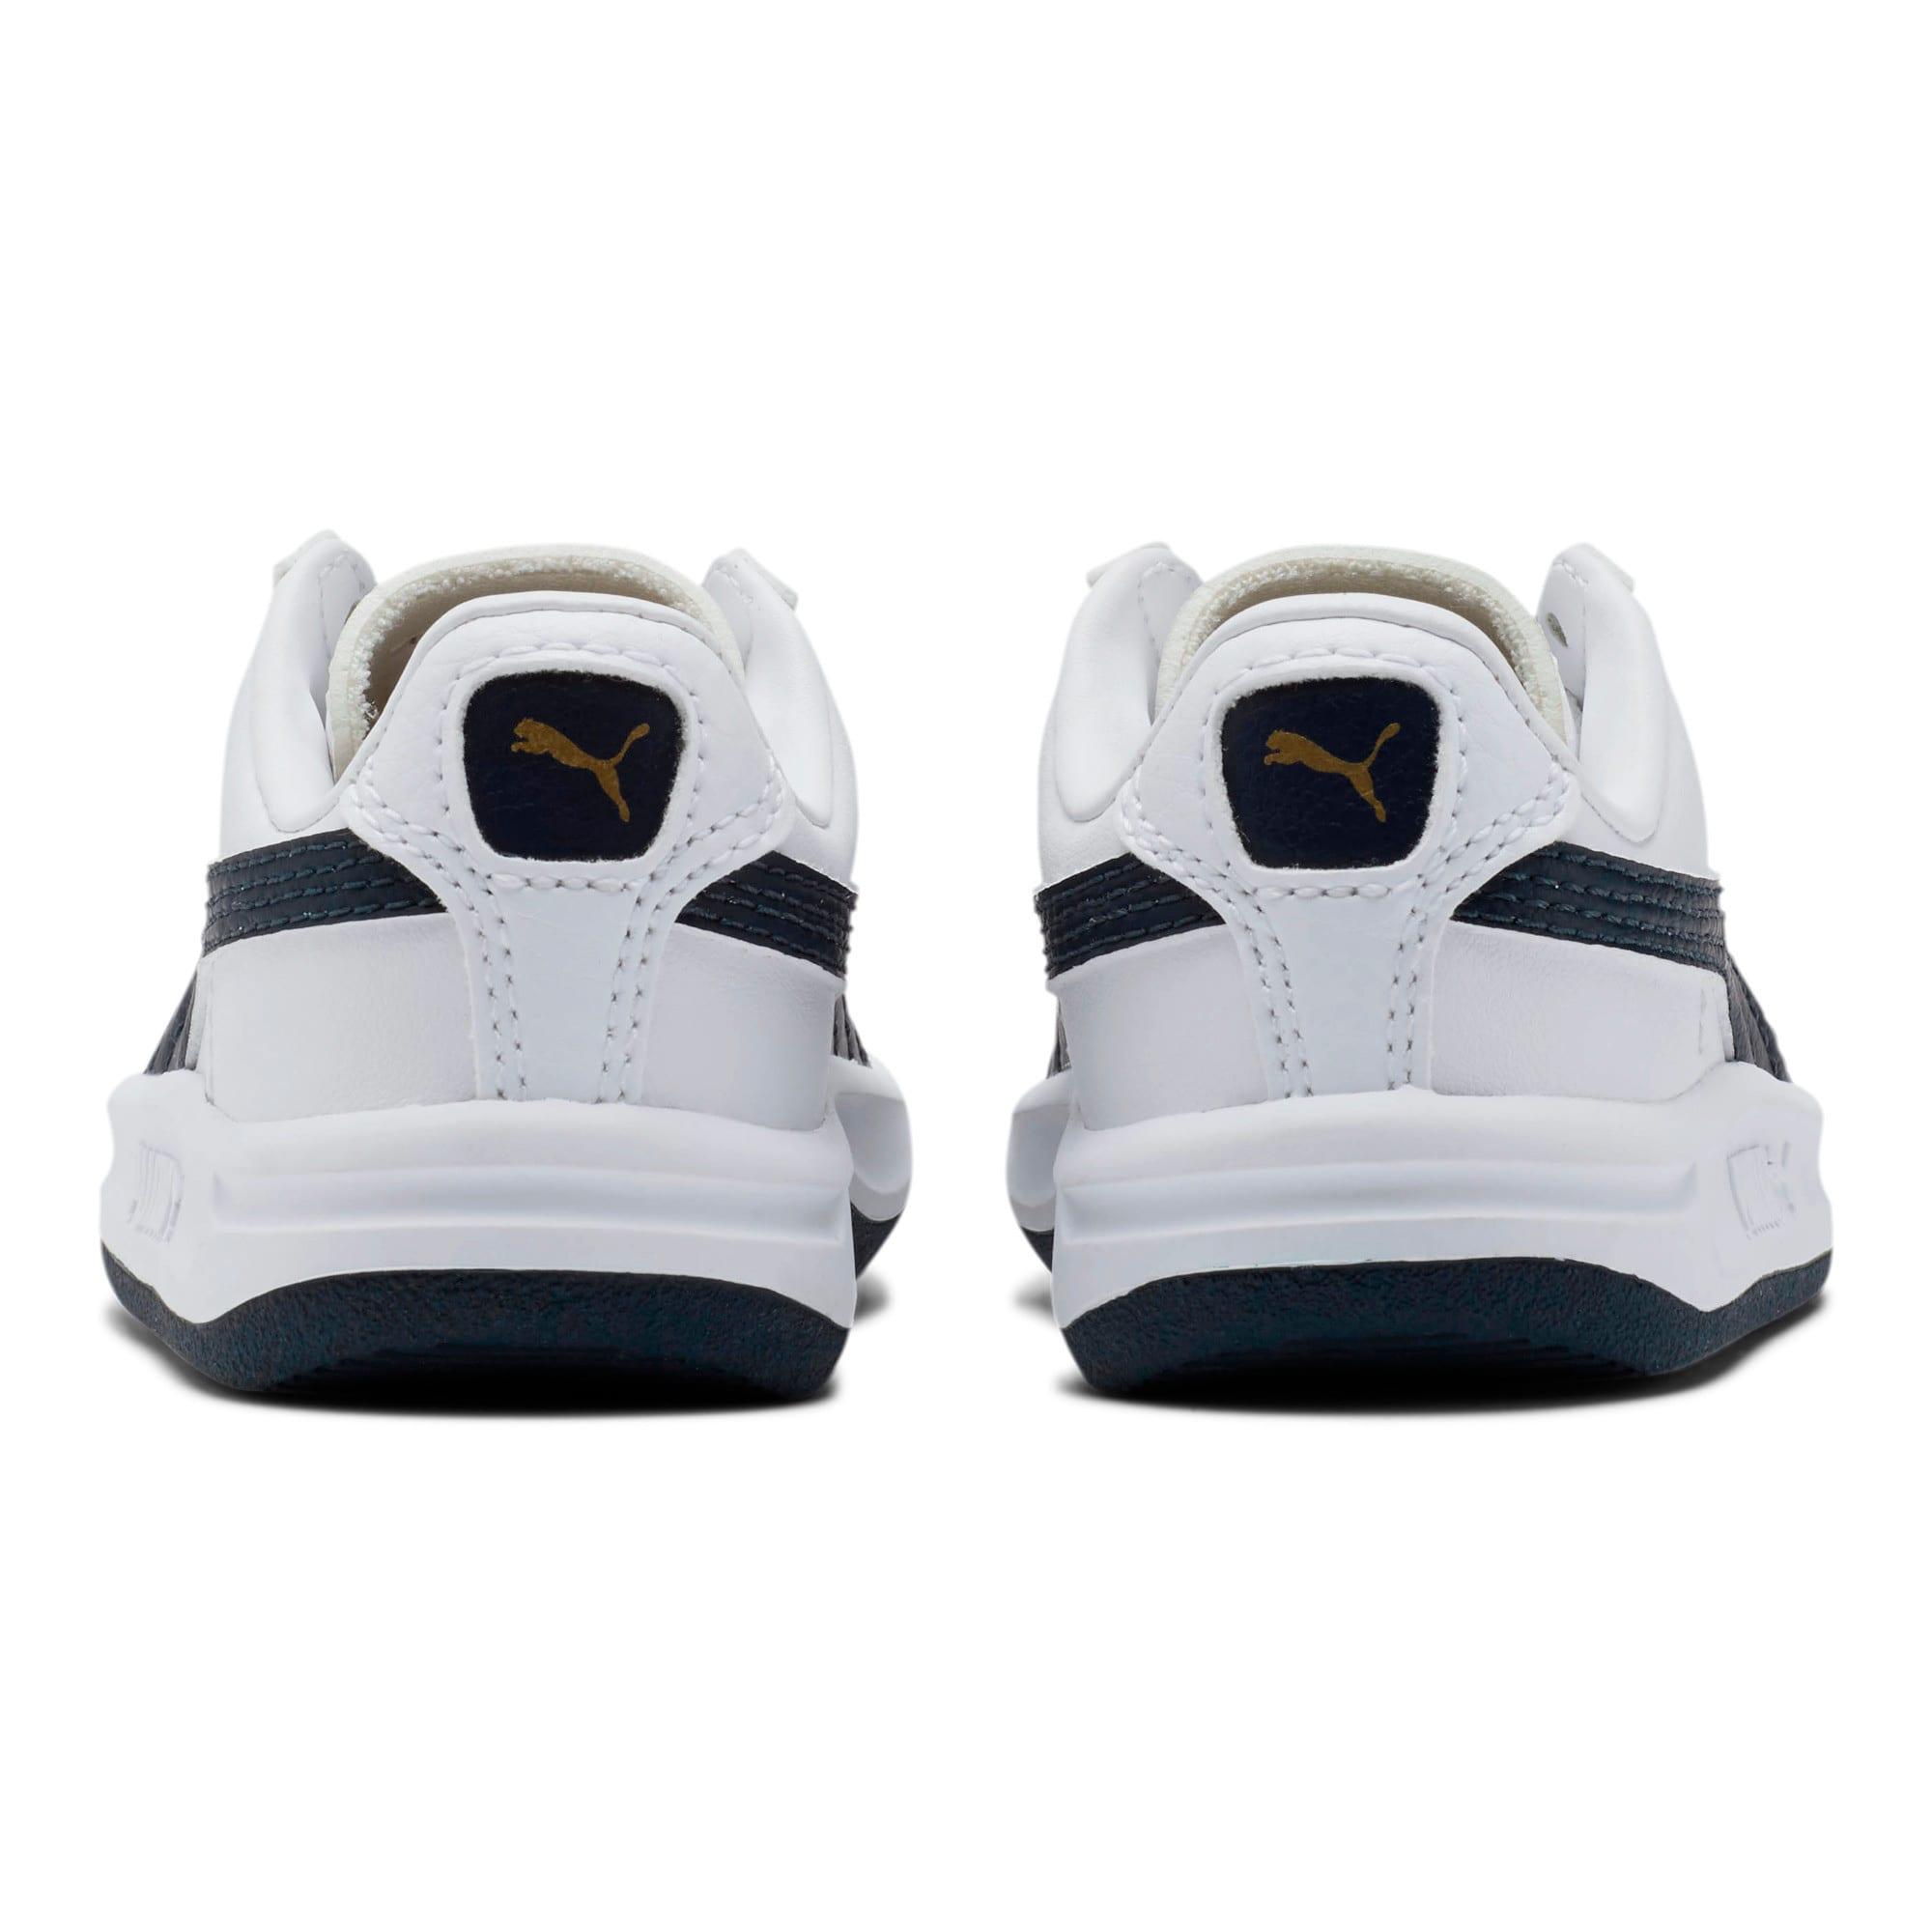 Thumbnail 4 of GV Special Toddler Shoes, Puma White-Peacoat, medium